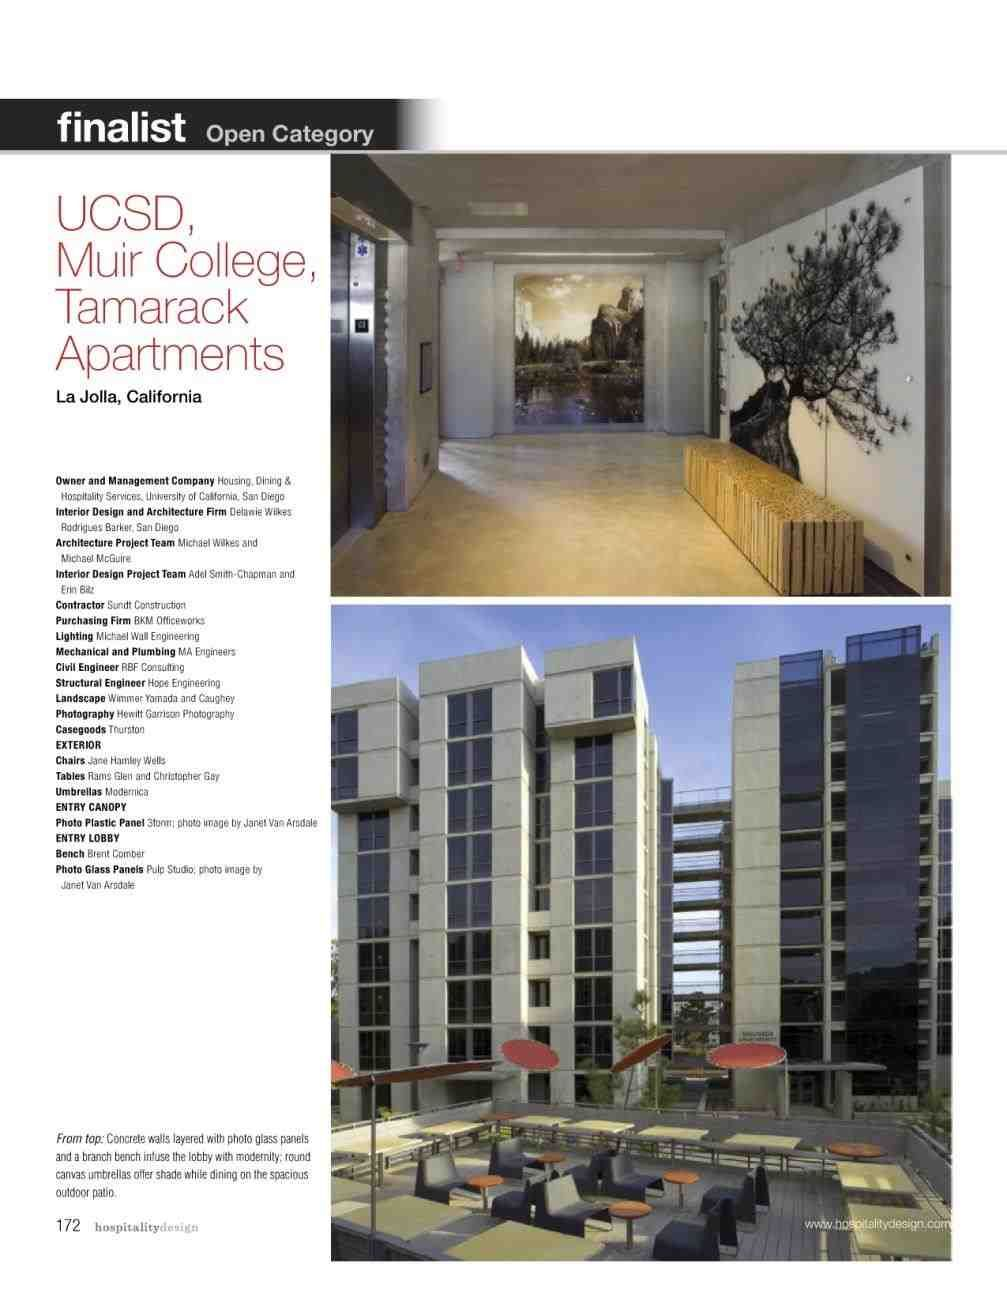 Apartment Ucsd Ridgewood Village Apartments Open Layout At